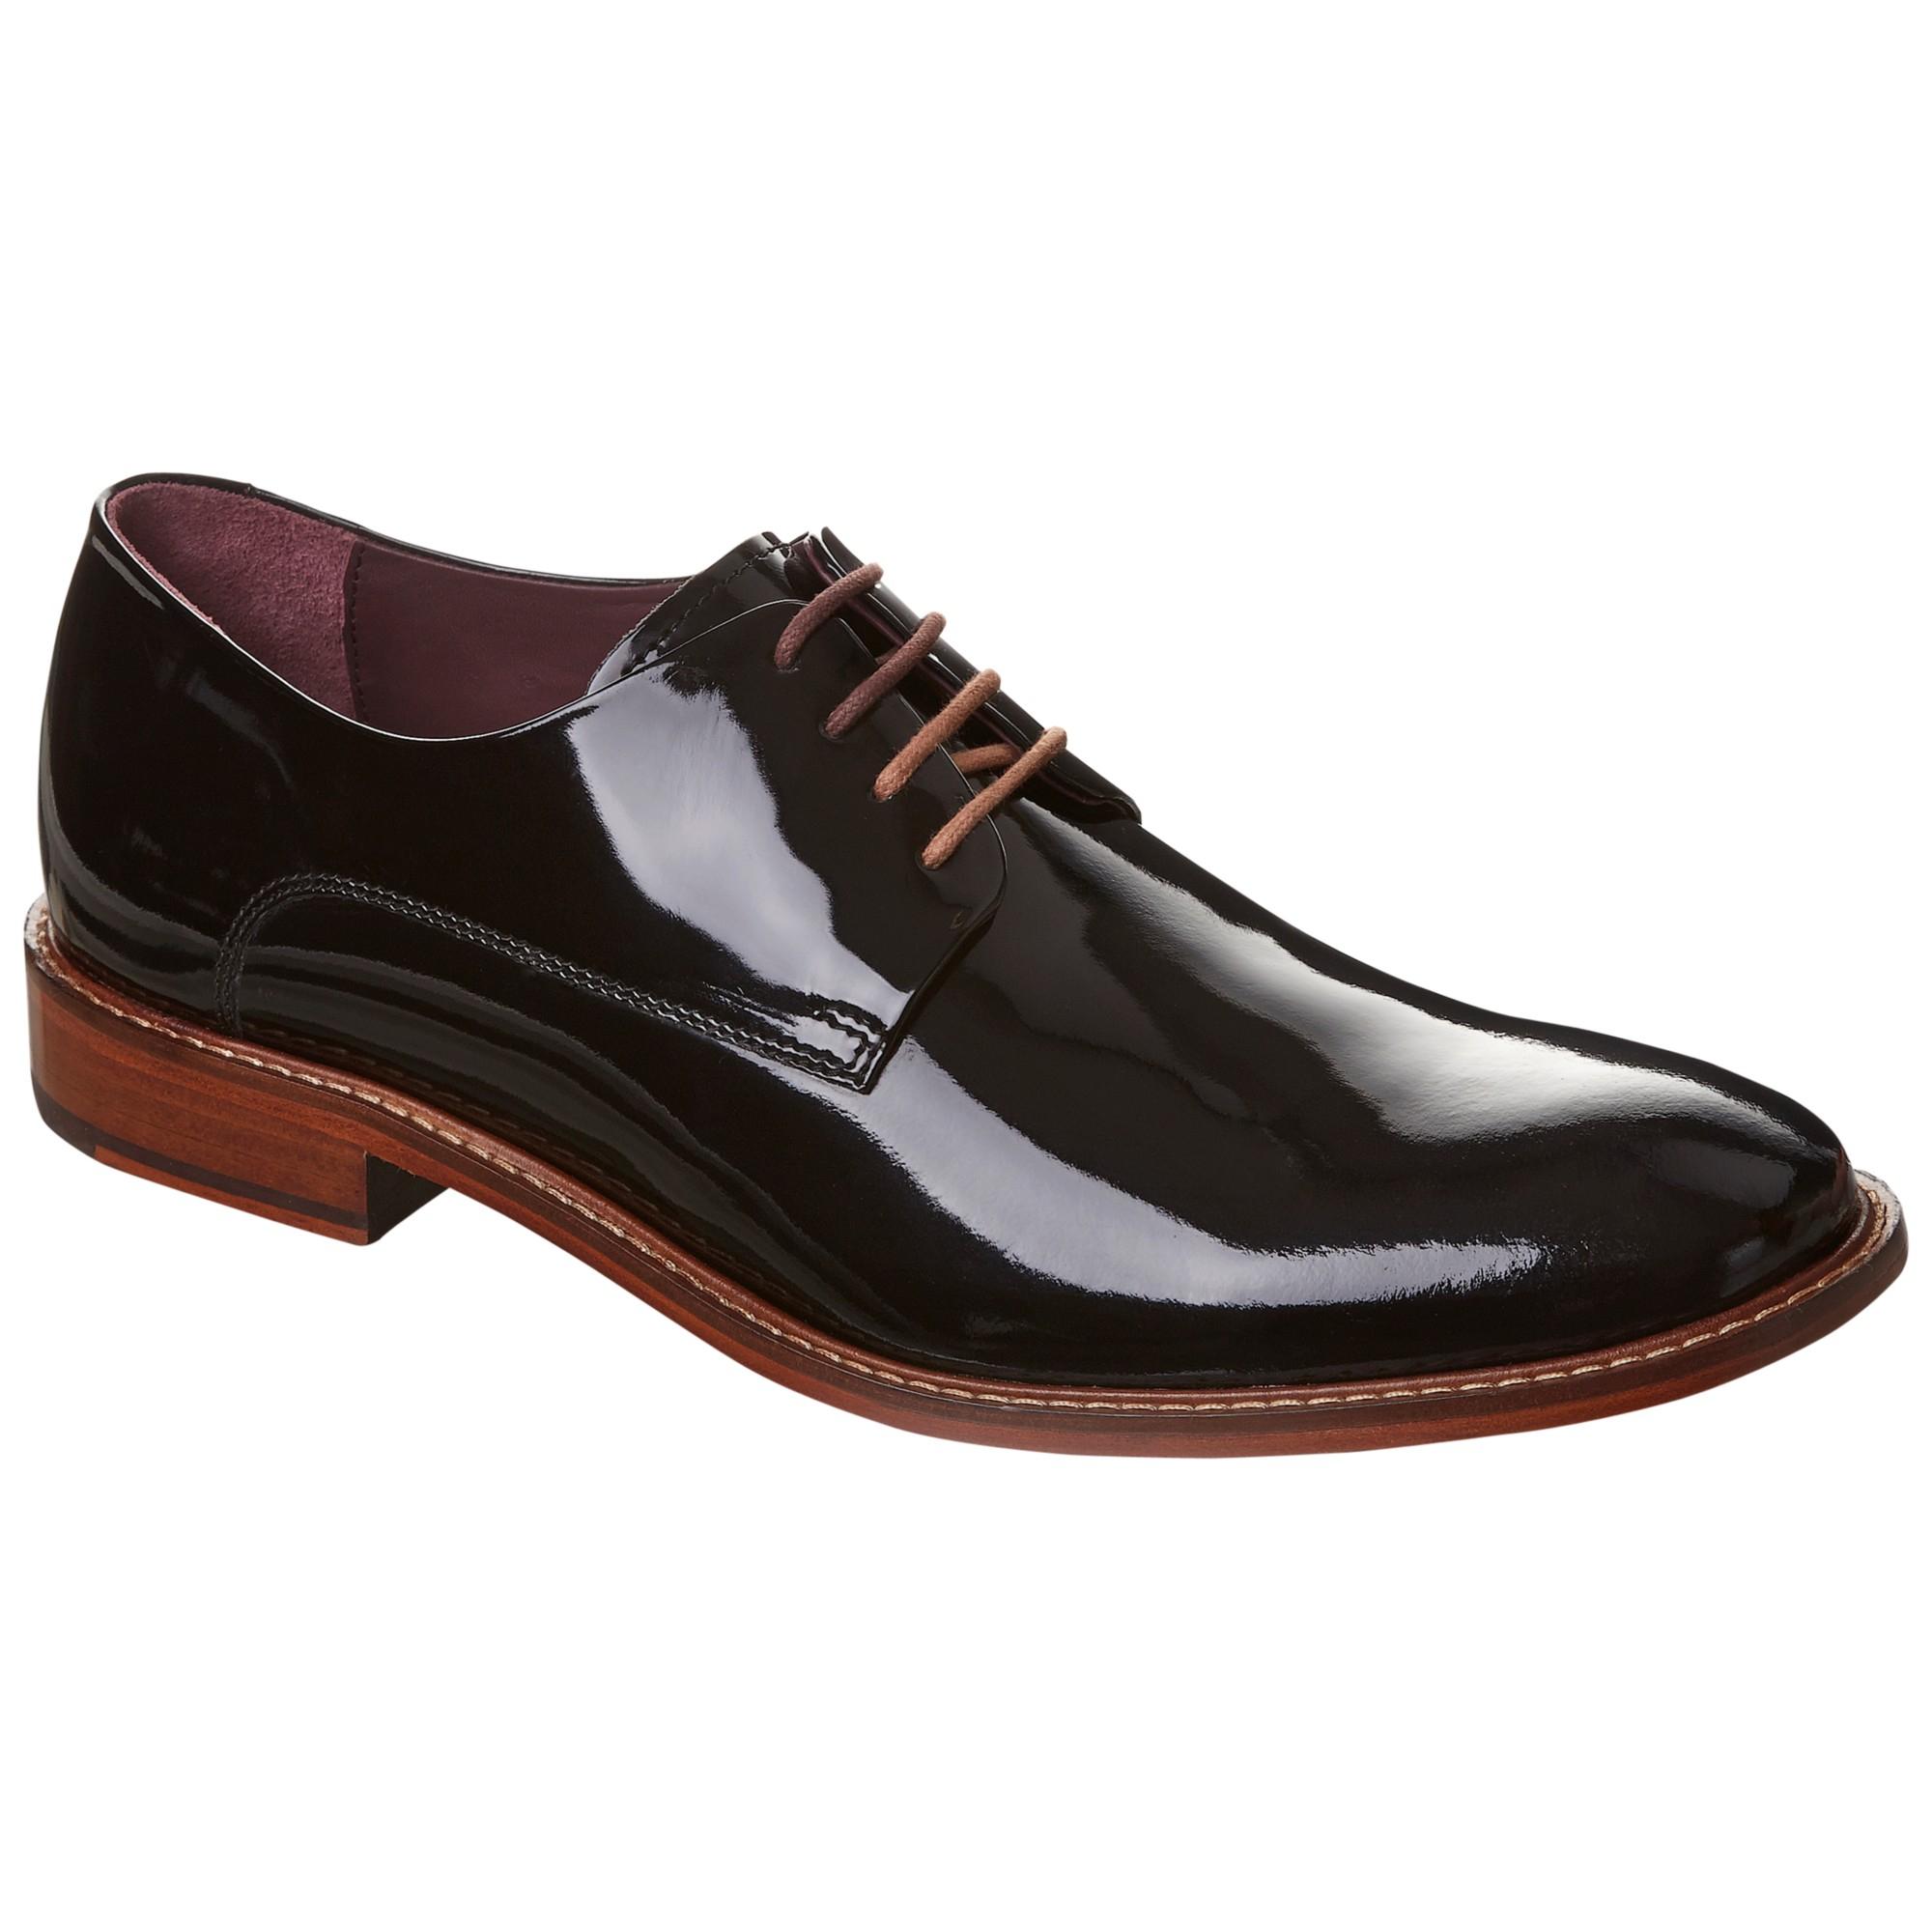 Asos Black Leather Derby Shoes